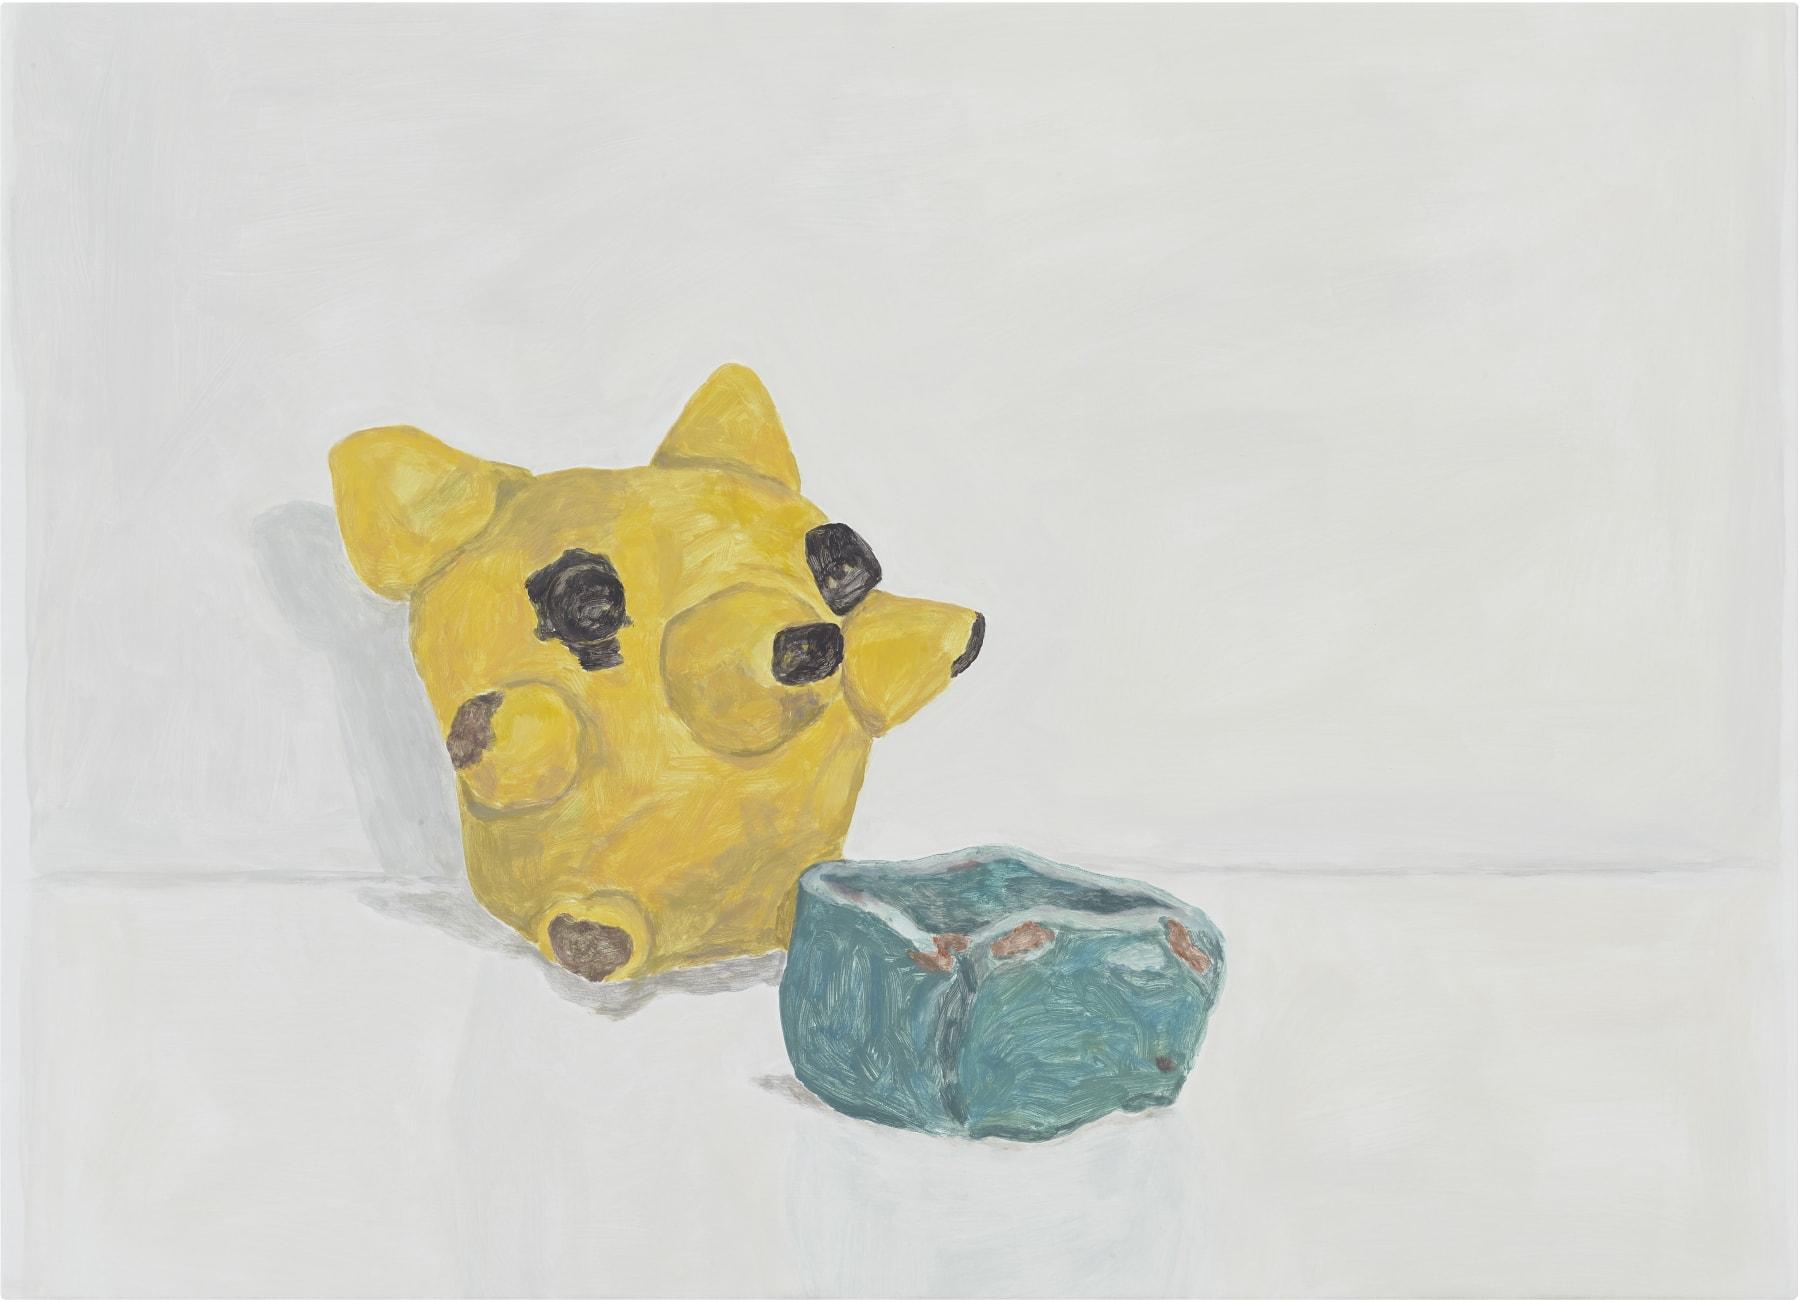 Francesca Fuchs Koala Bear, 2018 acrylic on canvas over board 30 x 41 1/2 in (76.2 x 105.4 cm) FF 46 $7,200